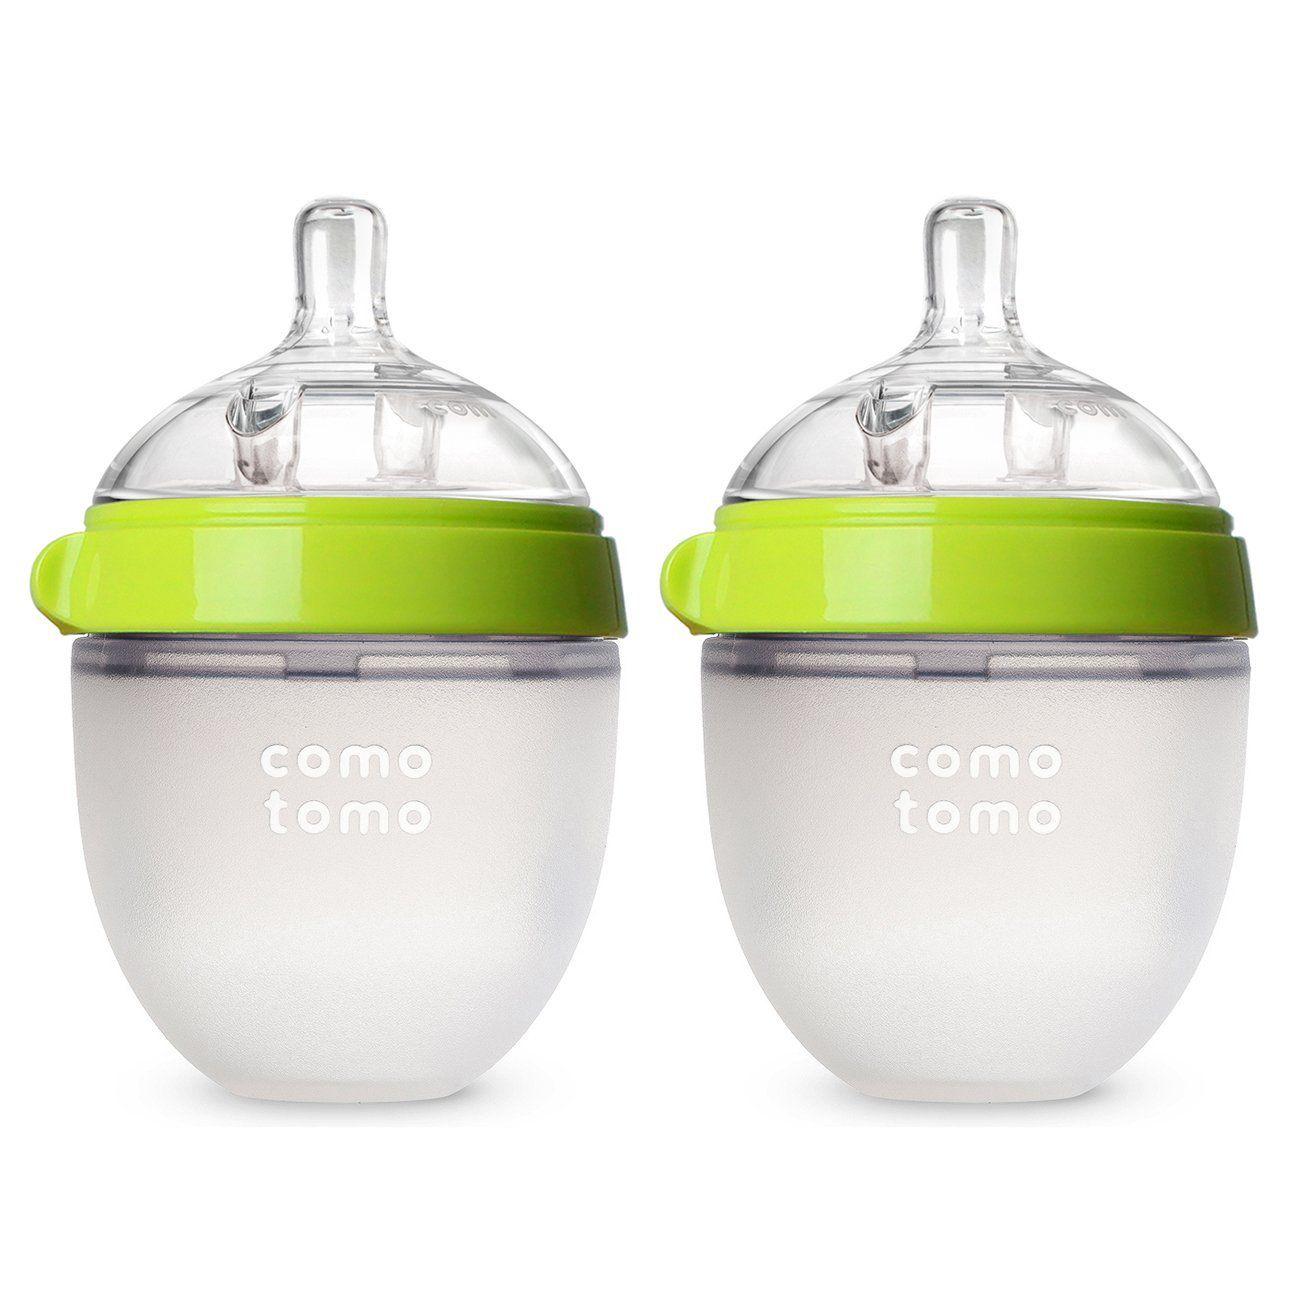 best bottles for breastfed babies 2019 The 7 Best Baby Bottles for Breastfed Babies of 2019